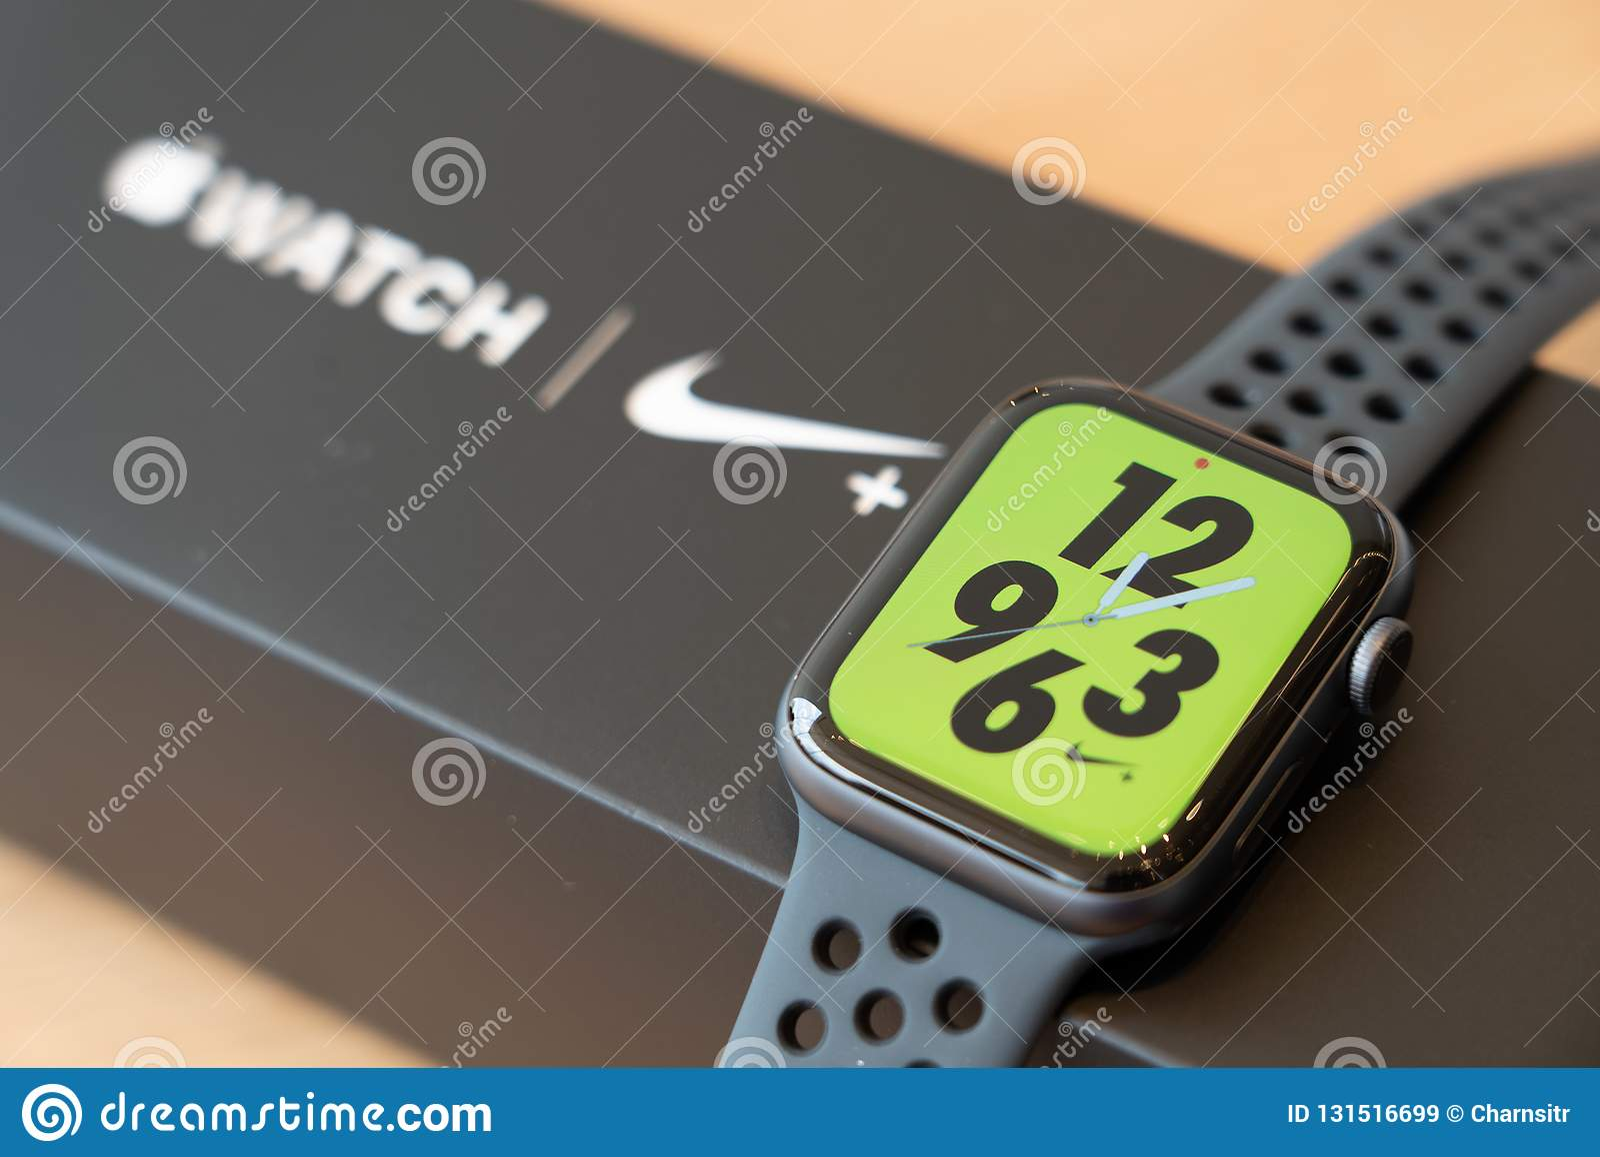 apple watch 4 nike edition